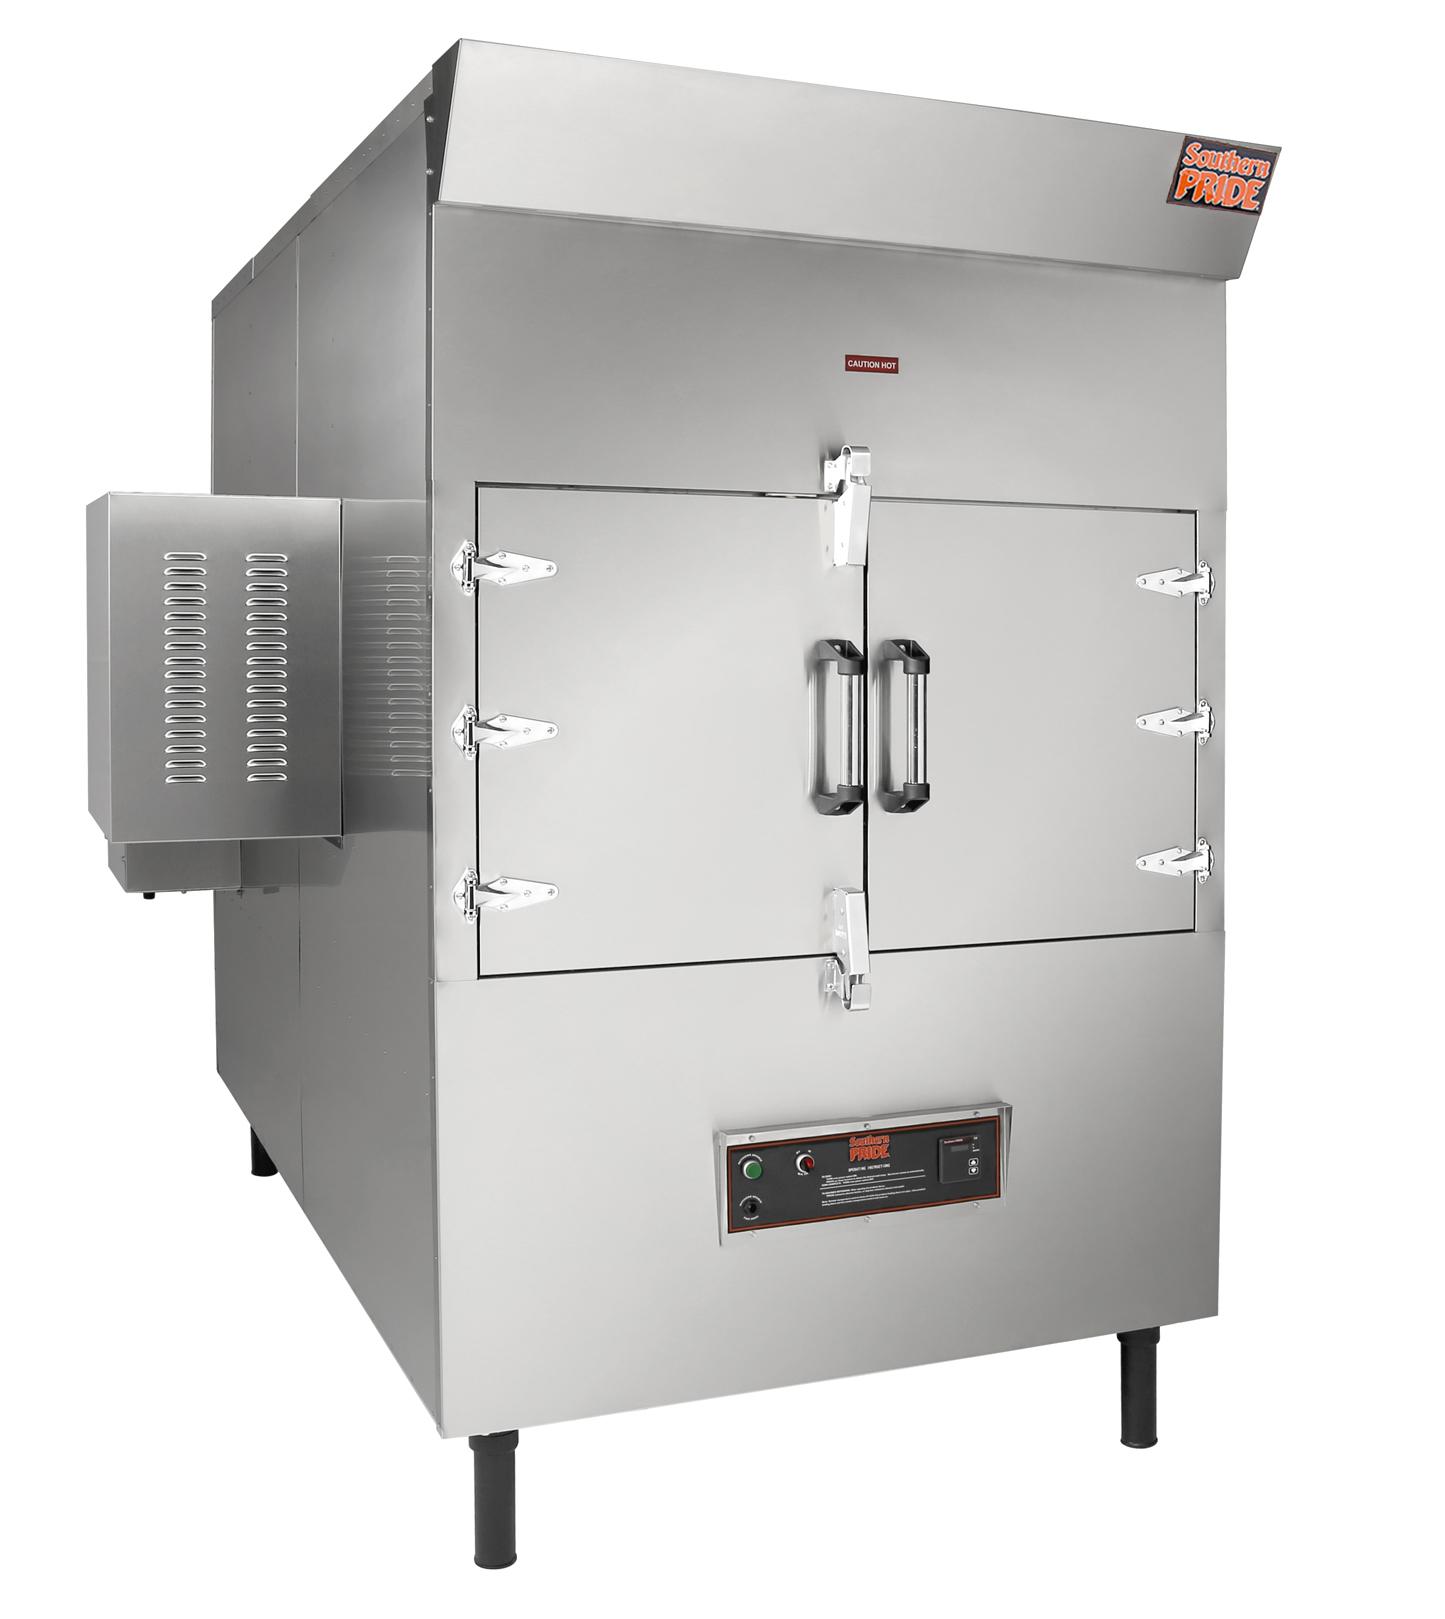 SPK 1400